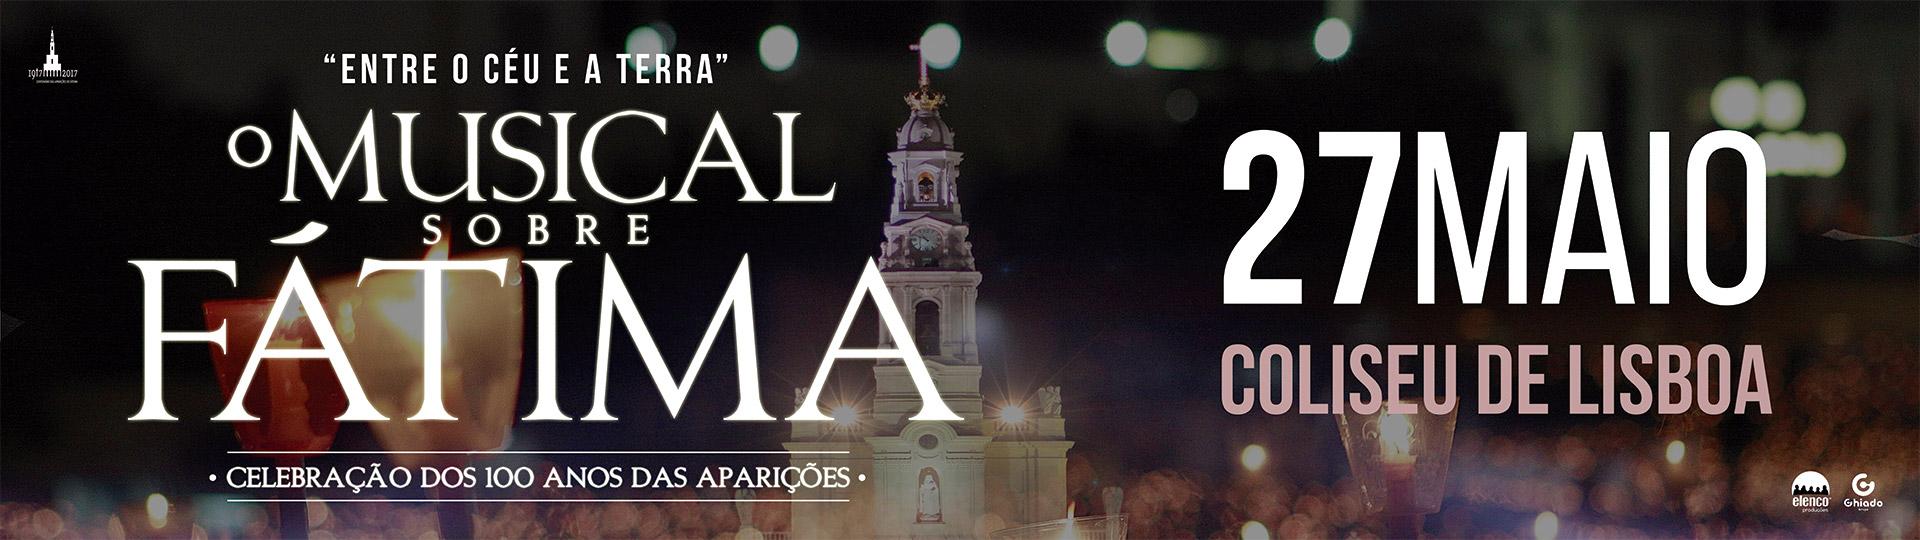 Músical Fátima